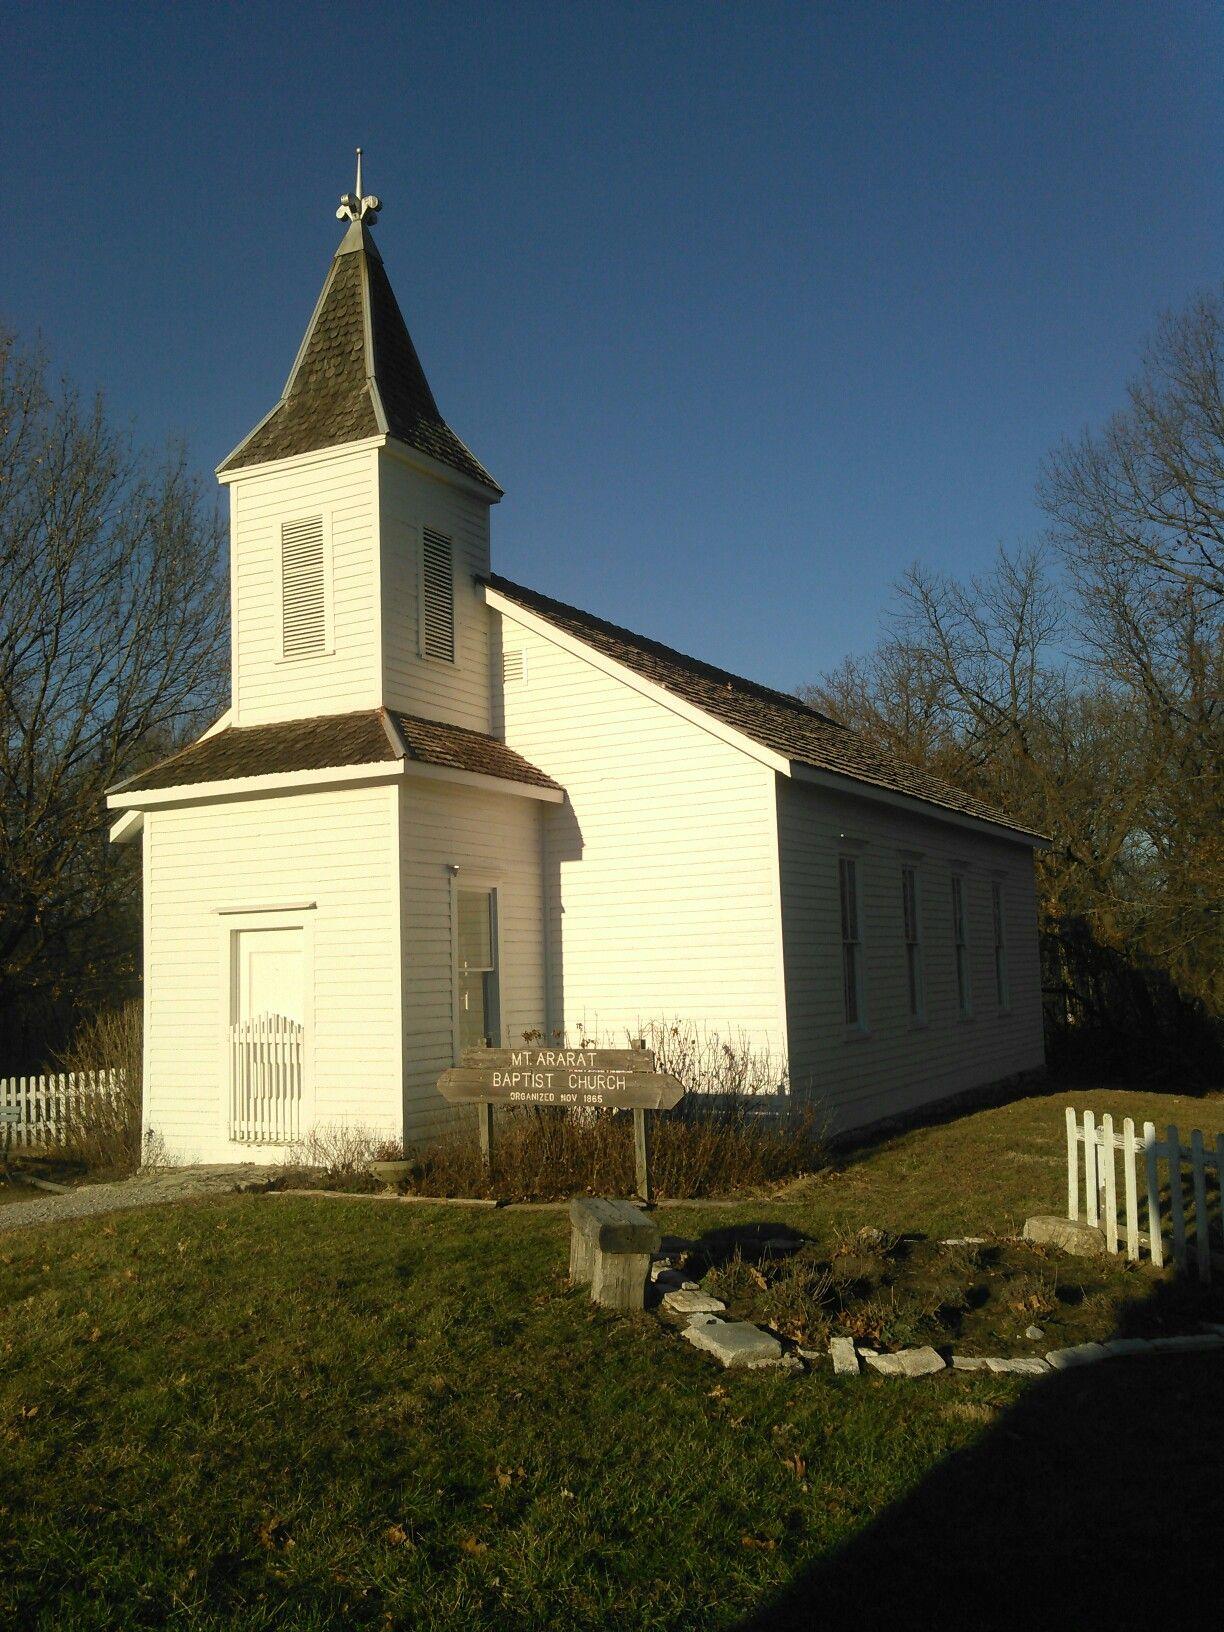 Shoal Creek Kansas City Missouri Church building